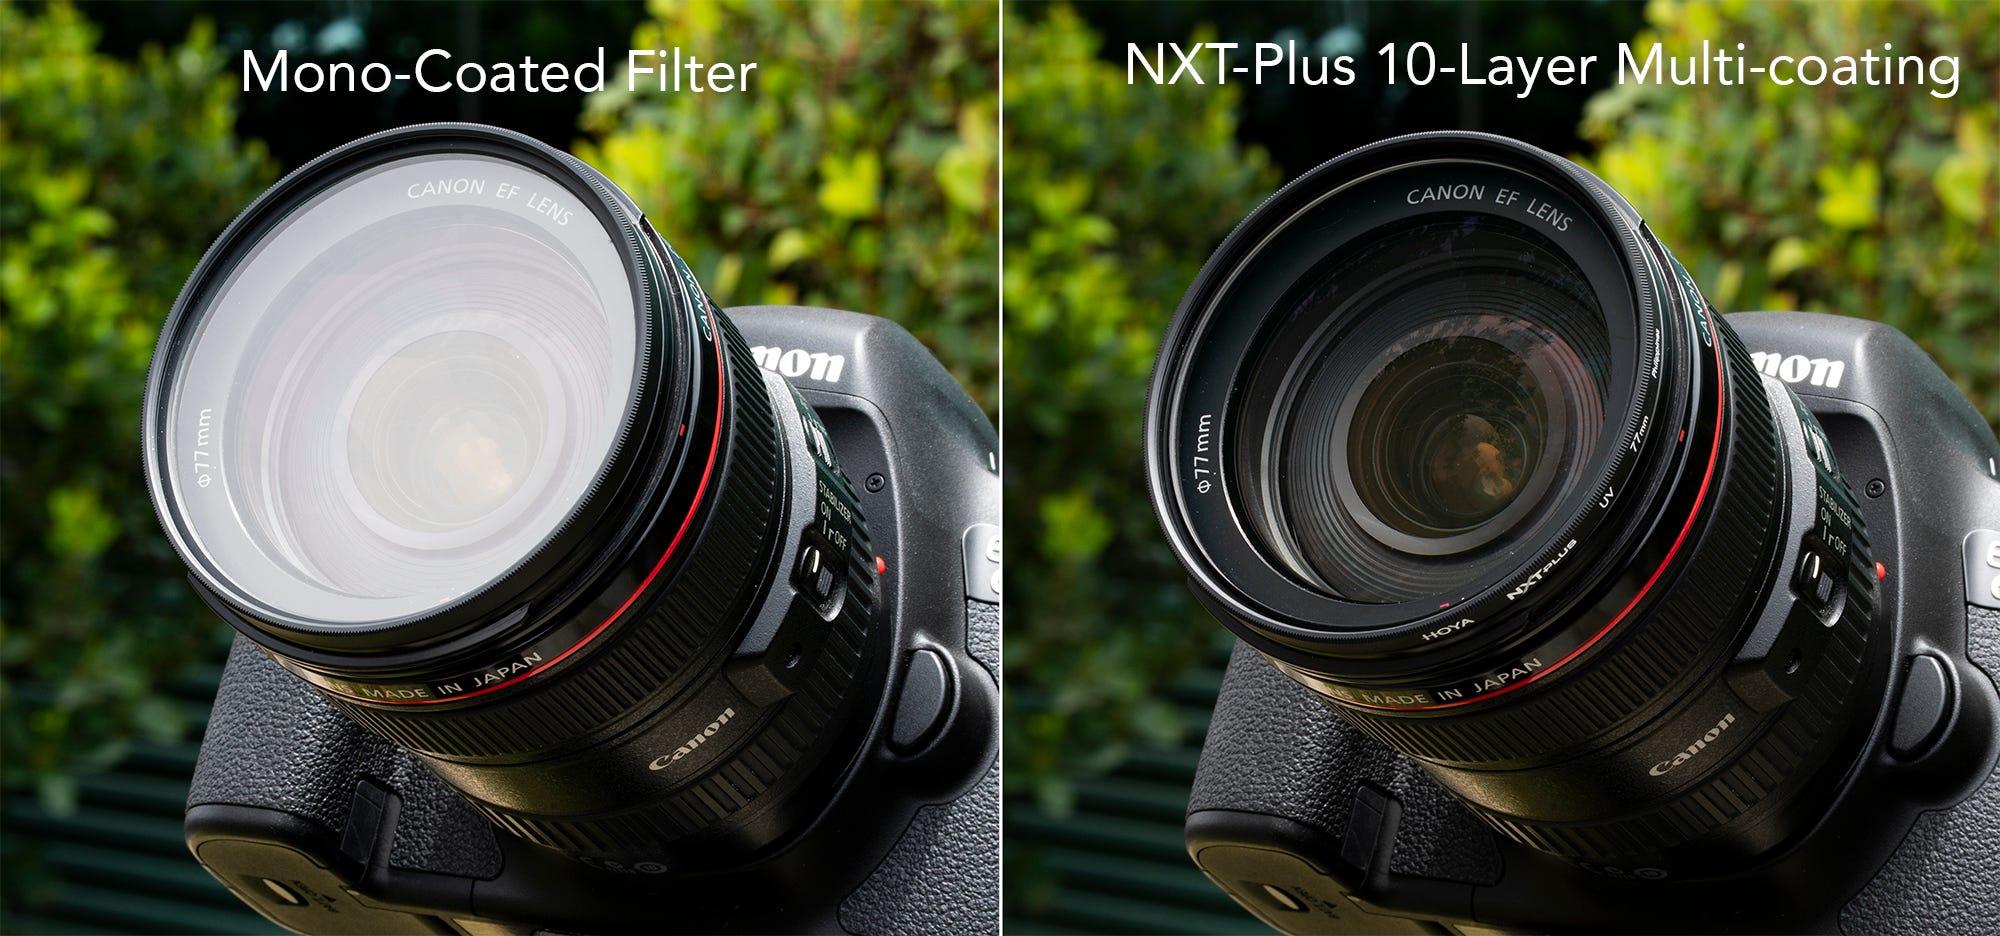 Low-Profile Aluminum Frame NXT Plus 67mm 10-Layer HMC Multi-Coated Circular Polarizer Lens Filter Hoya NXT Plus 67mm 10-Layer HMC Multi-Coated UV Lens Filter